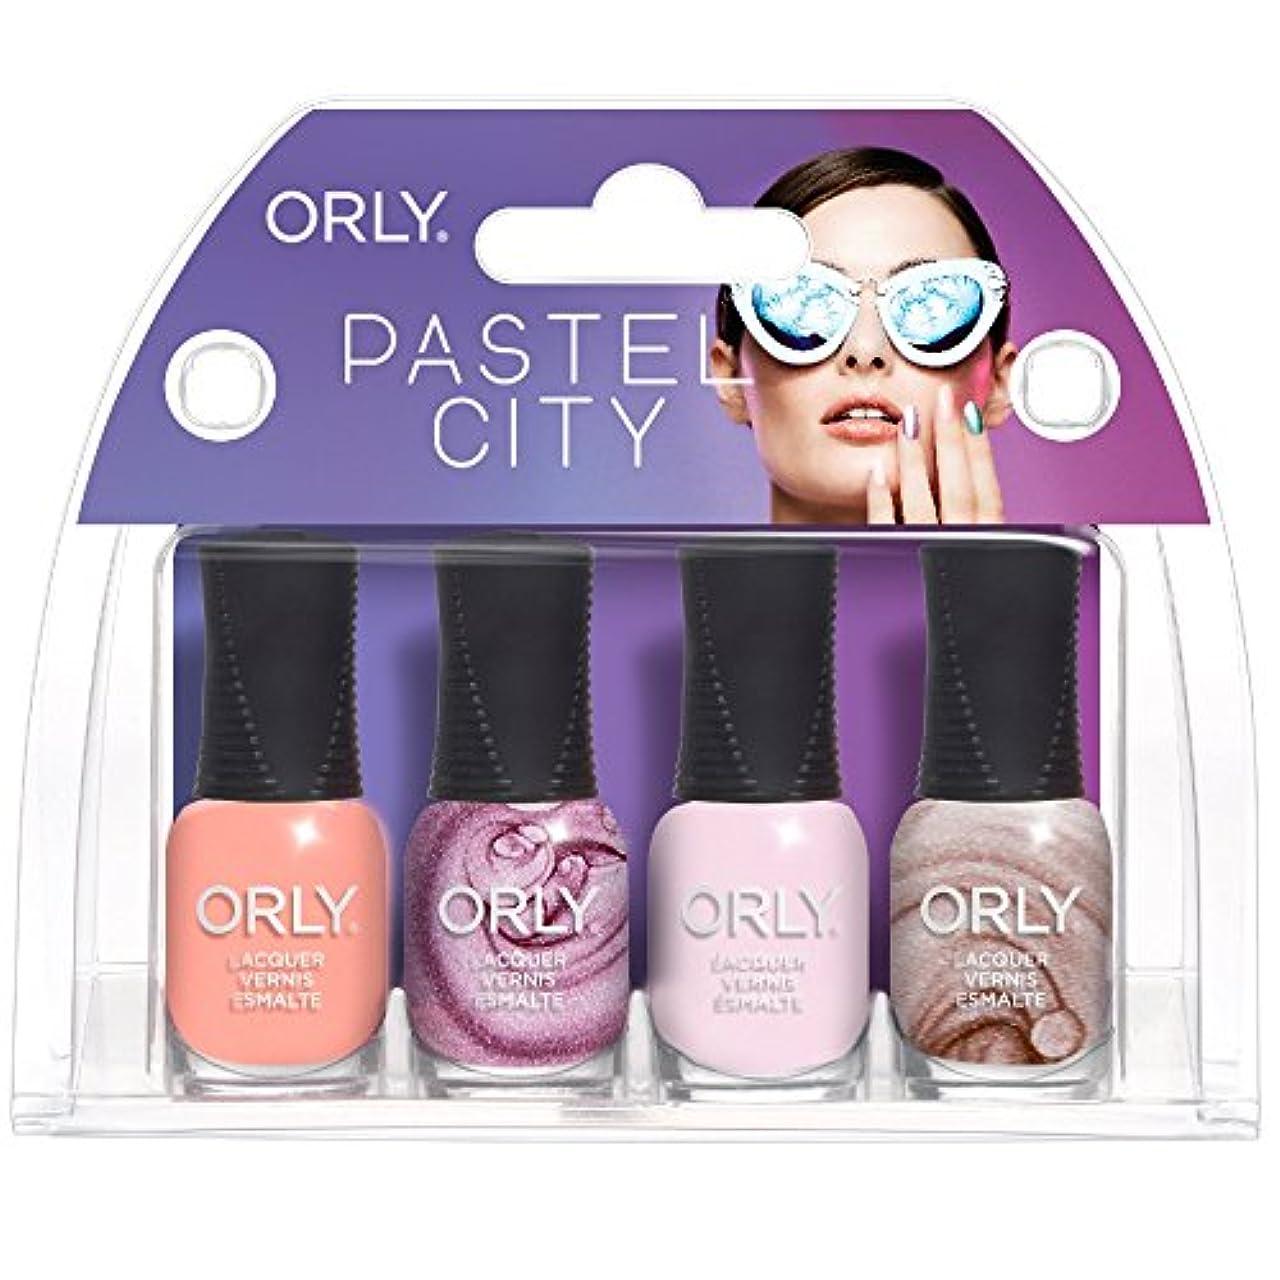 公爵夫人ランチ暴力Orly Pastel City - Mini 4pc Kit - 0.18oz / 5.3ml Each - 28329